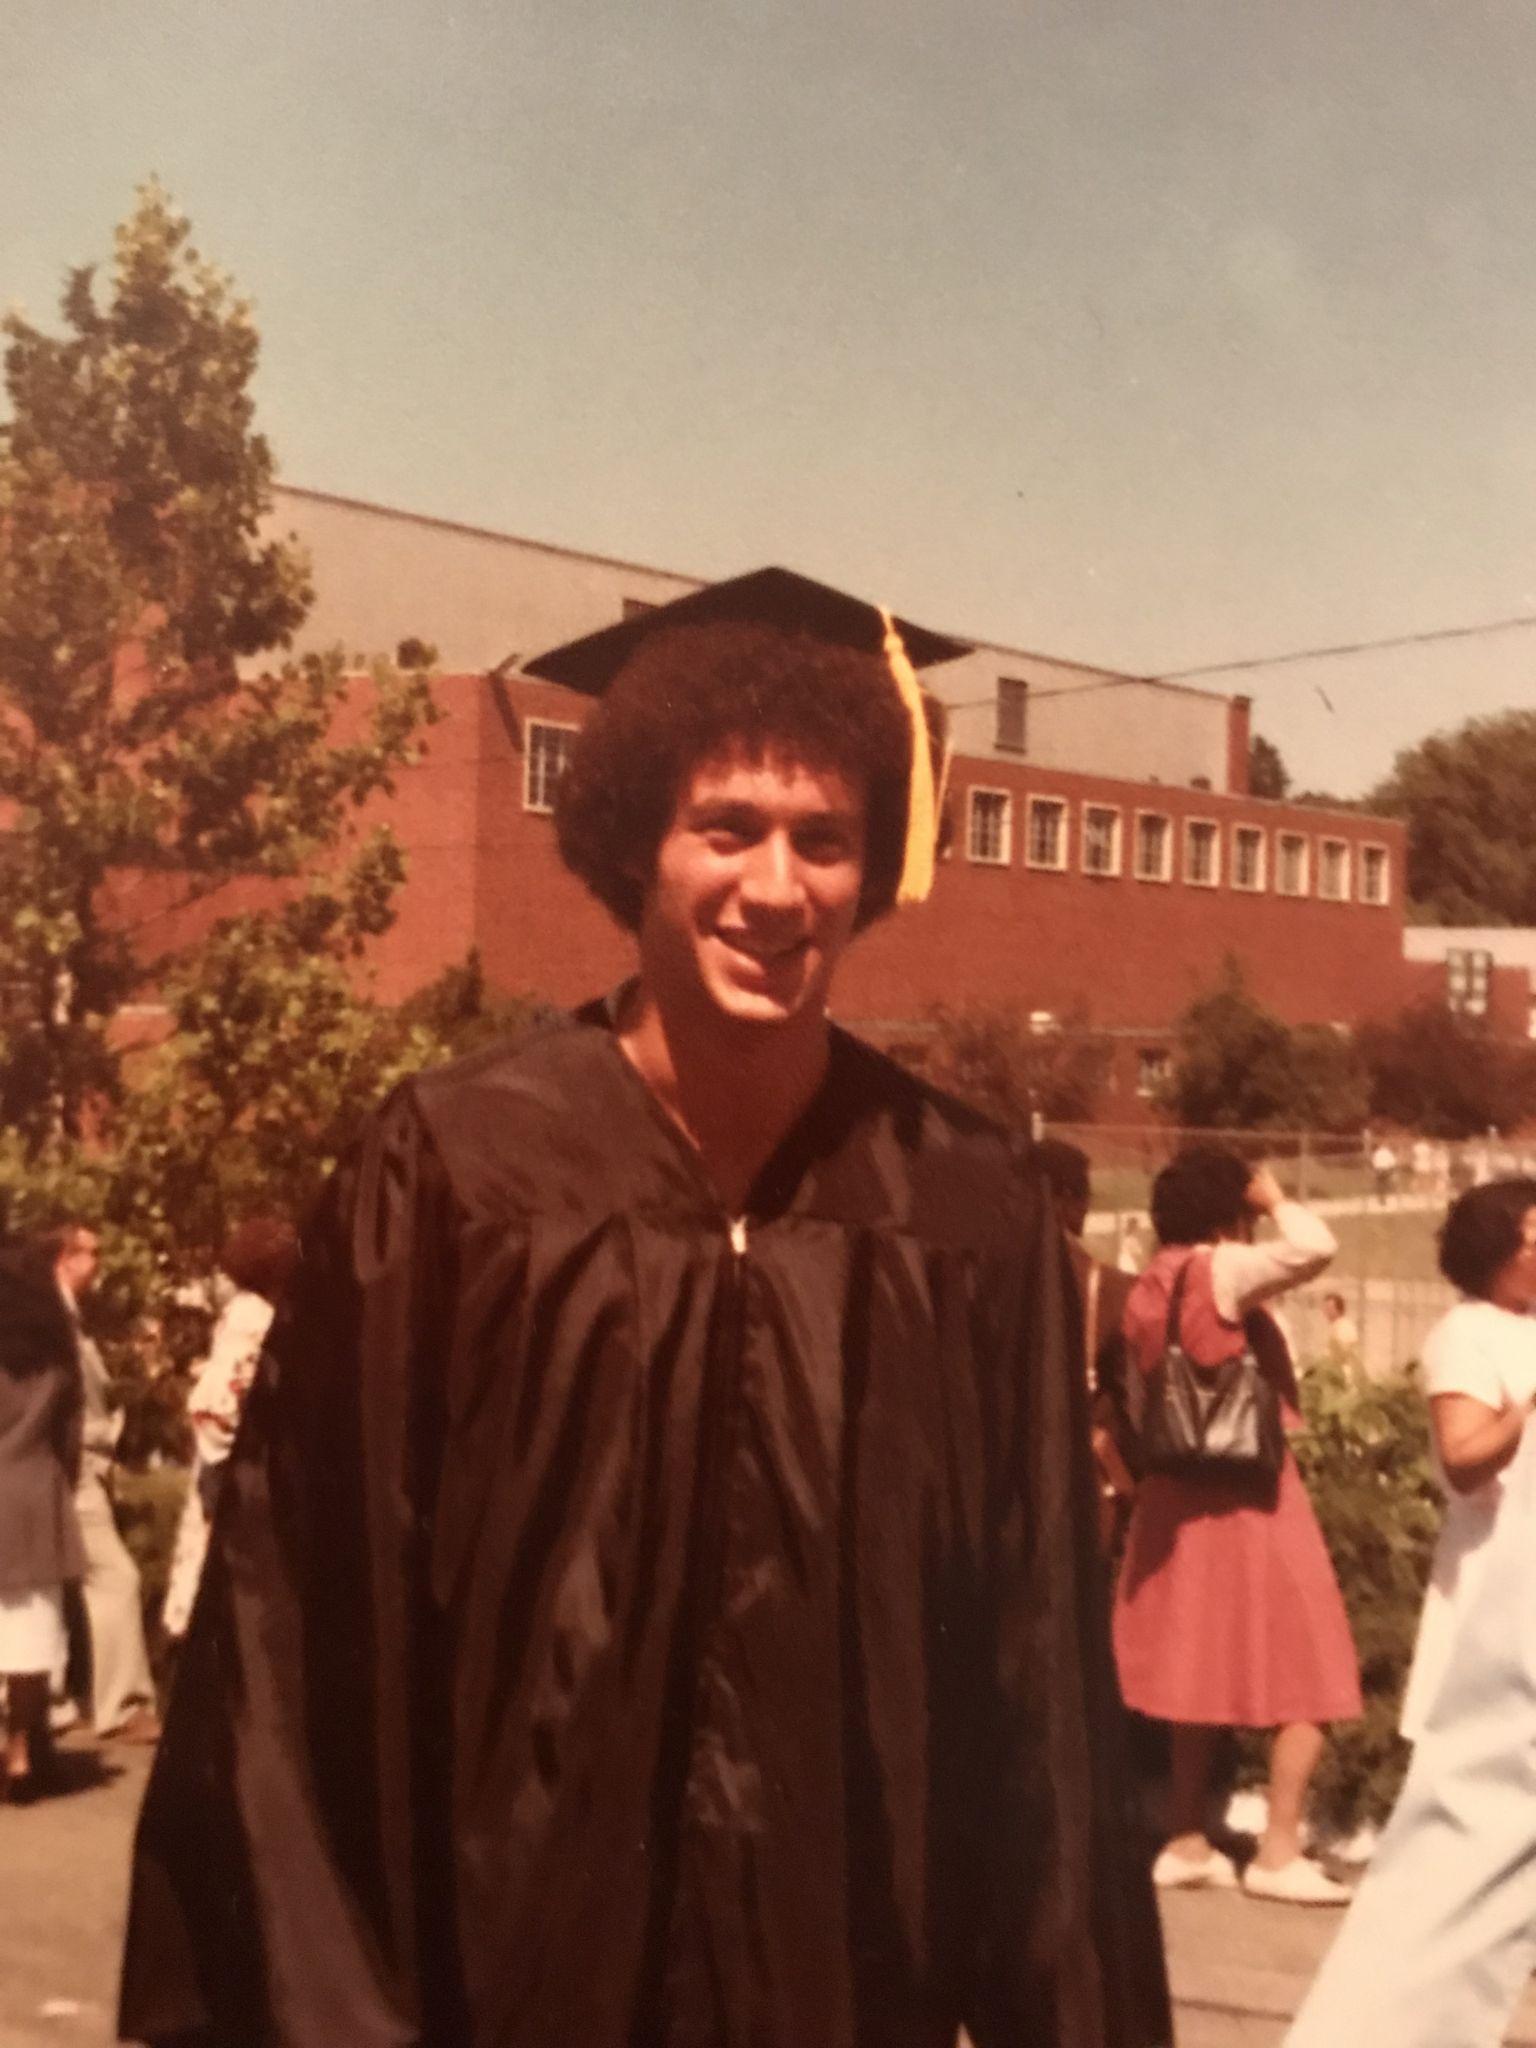 Man wearing graduation regalia